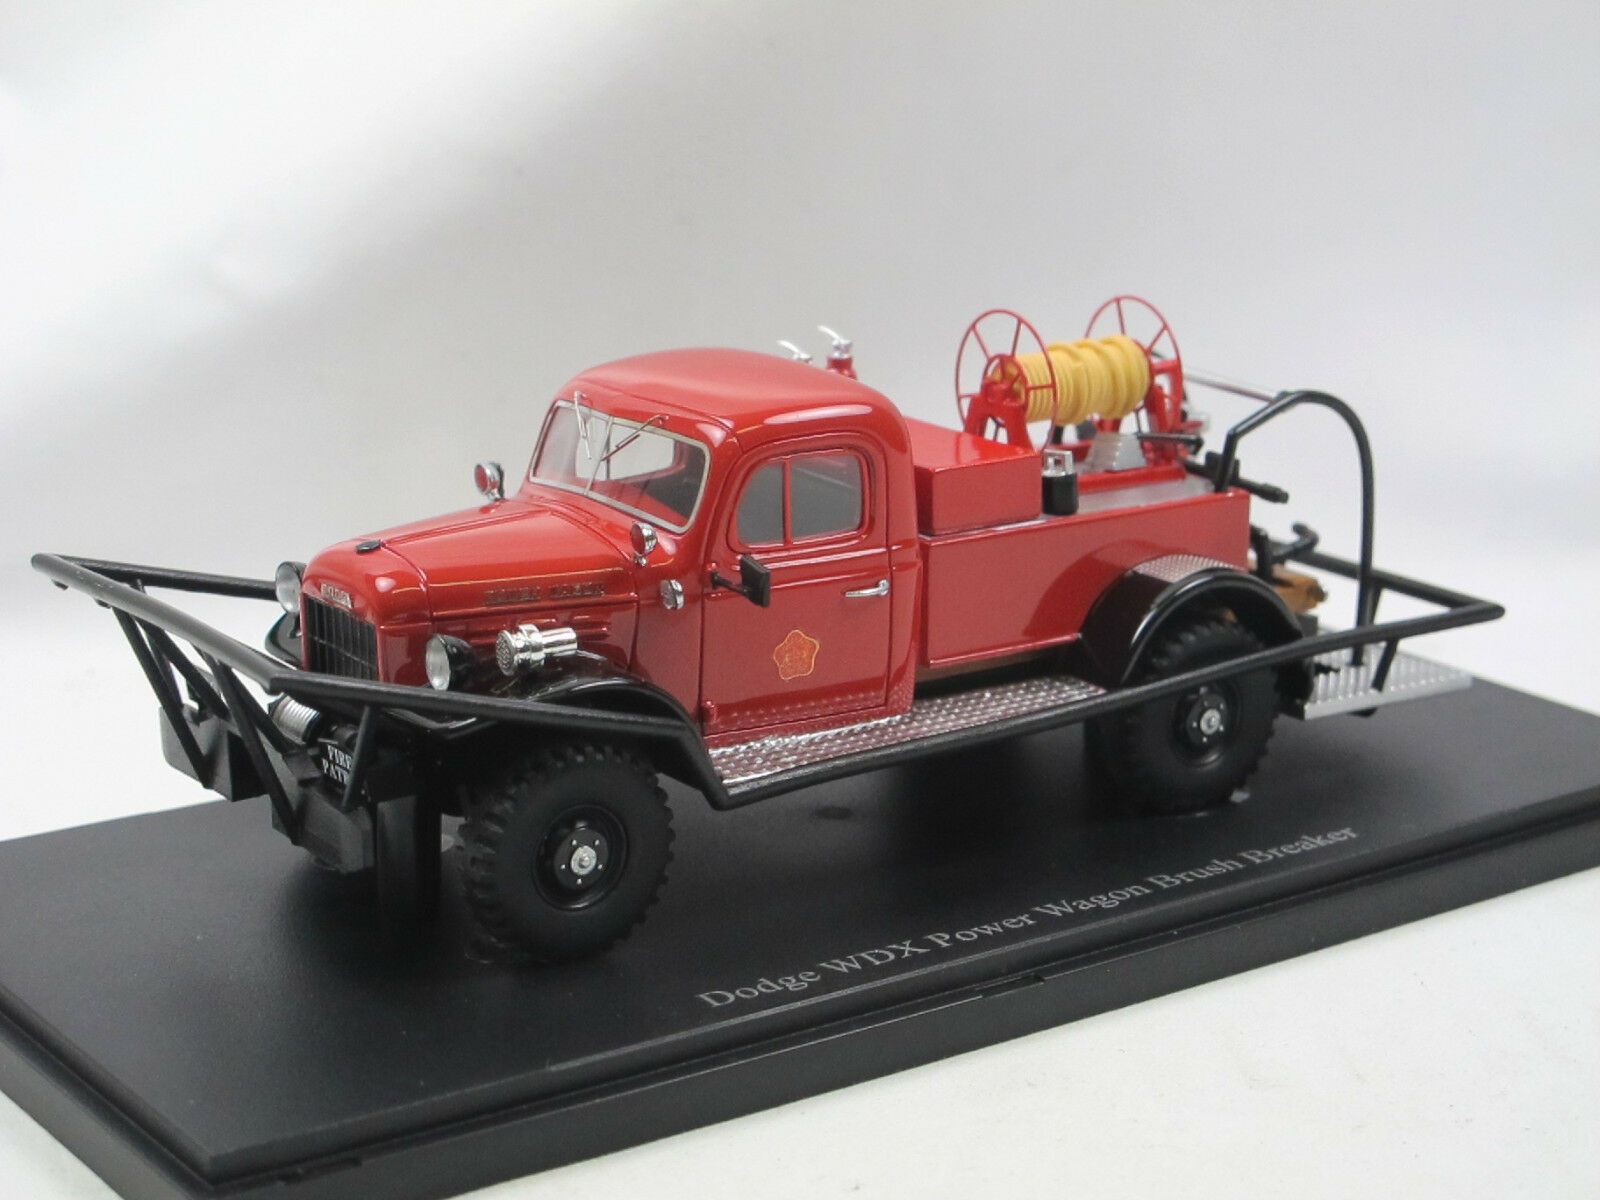 Autocult 12009 - 1946 DODGE WDX Power Wagon Brush Braker US FIRE ENGINE 1 43